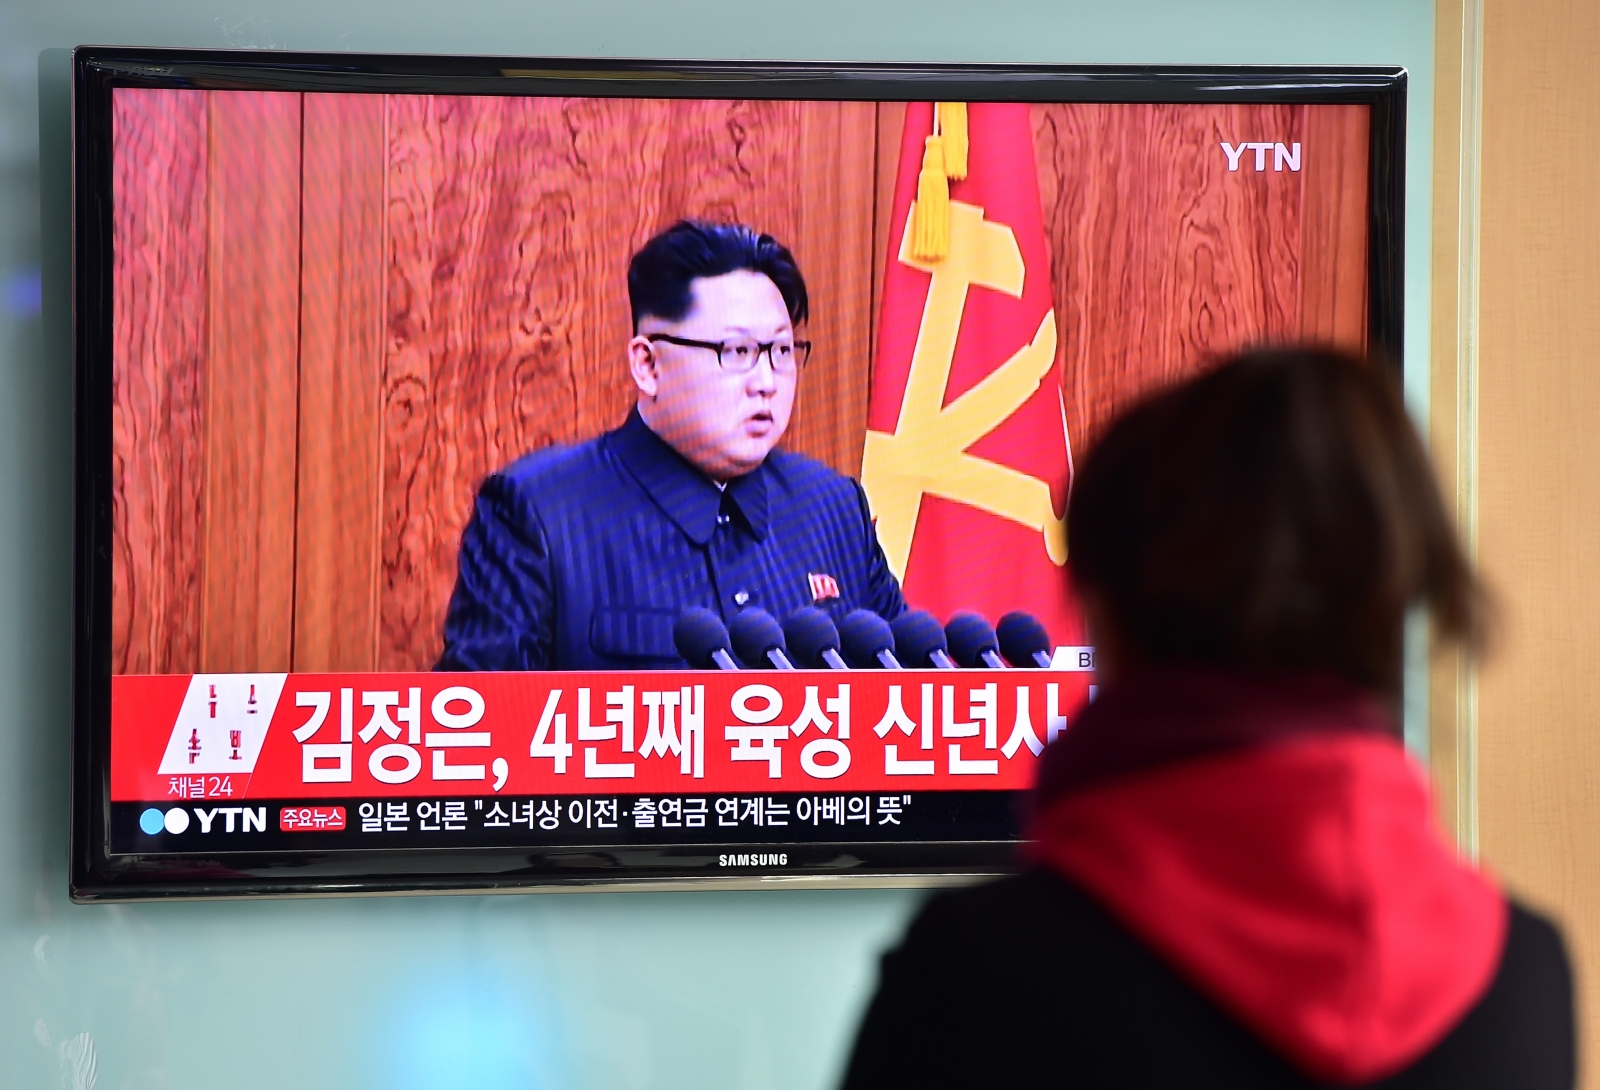 North Korea dictator